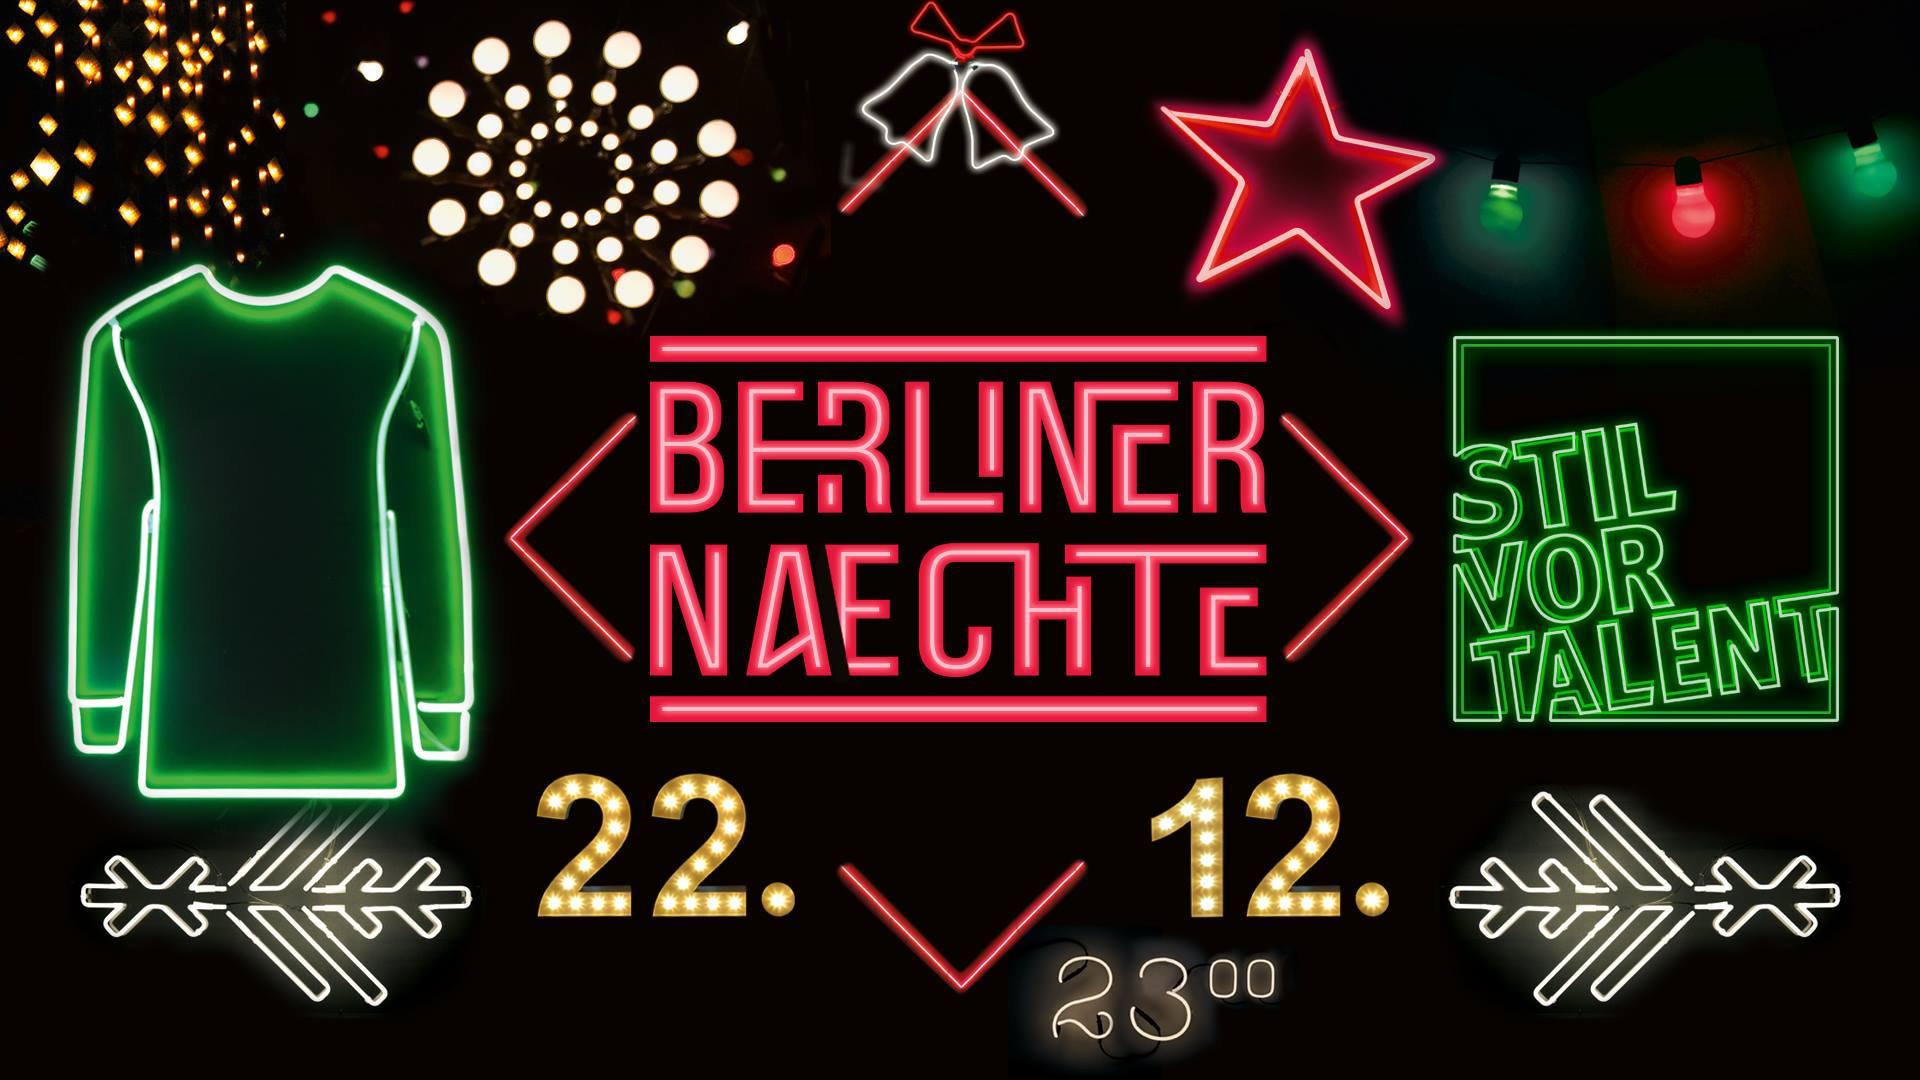 Berliner Nächte – Stil vor Talent Showcase